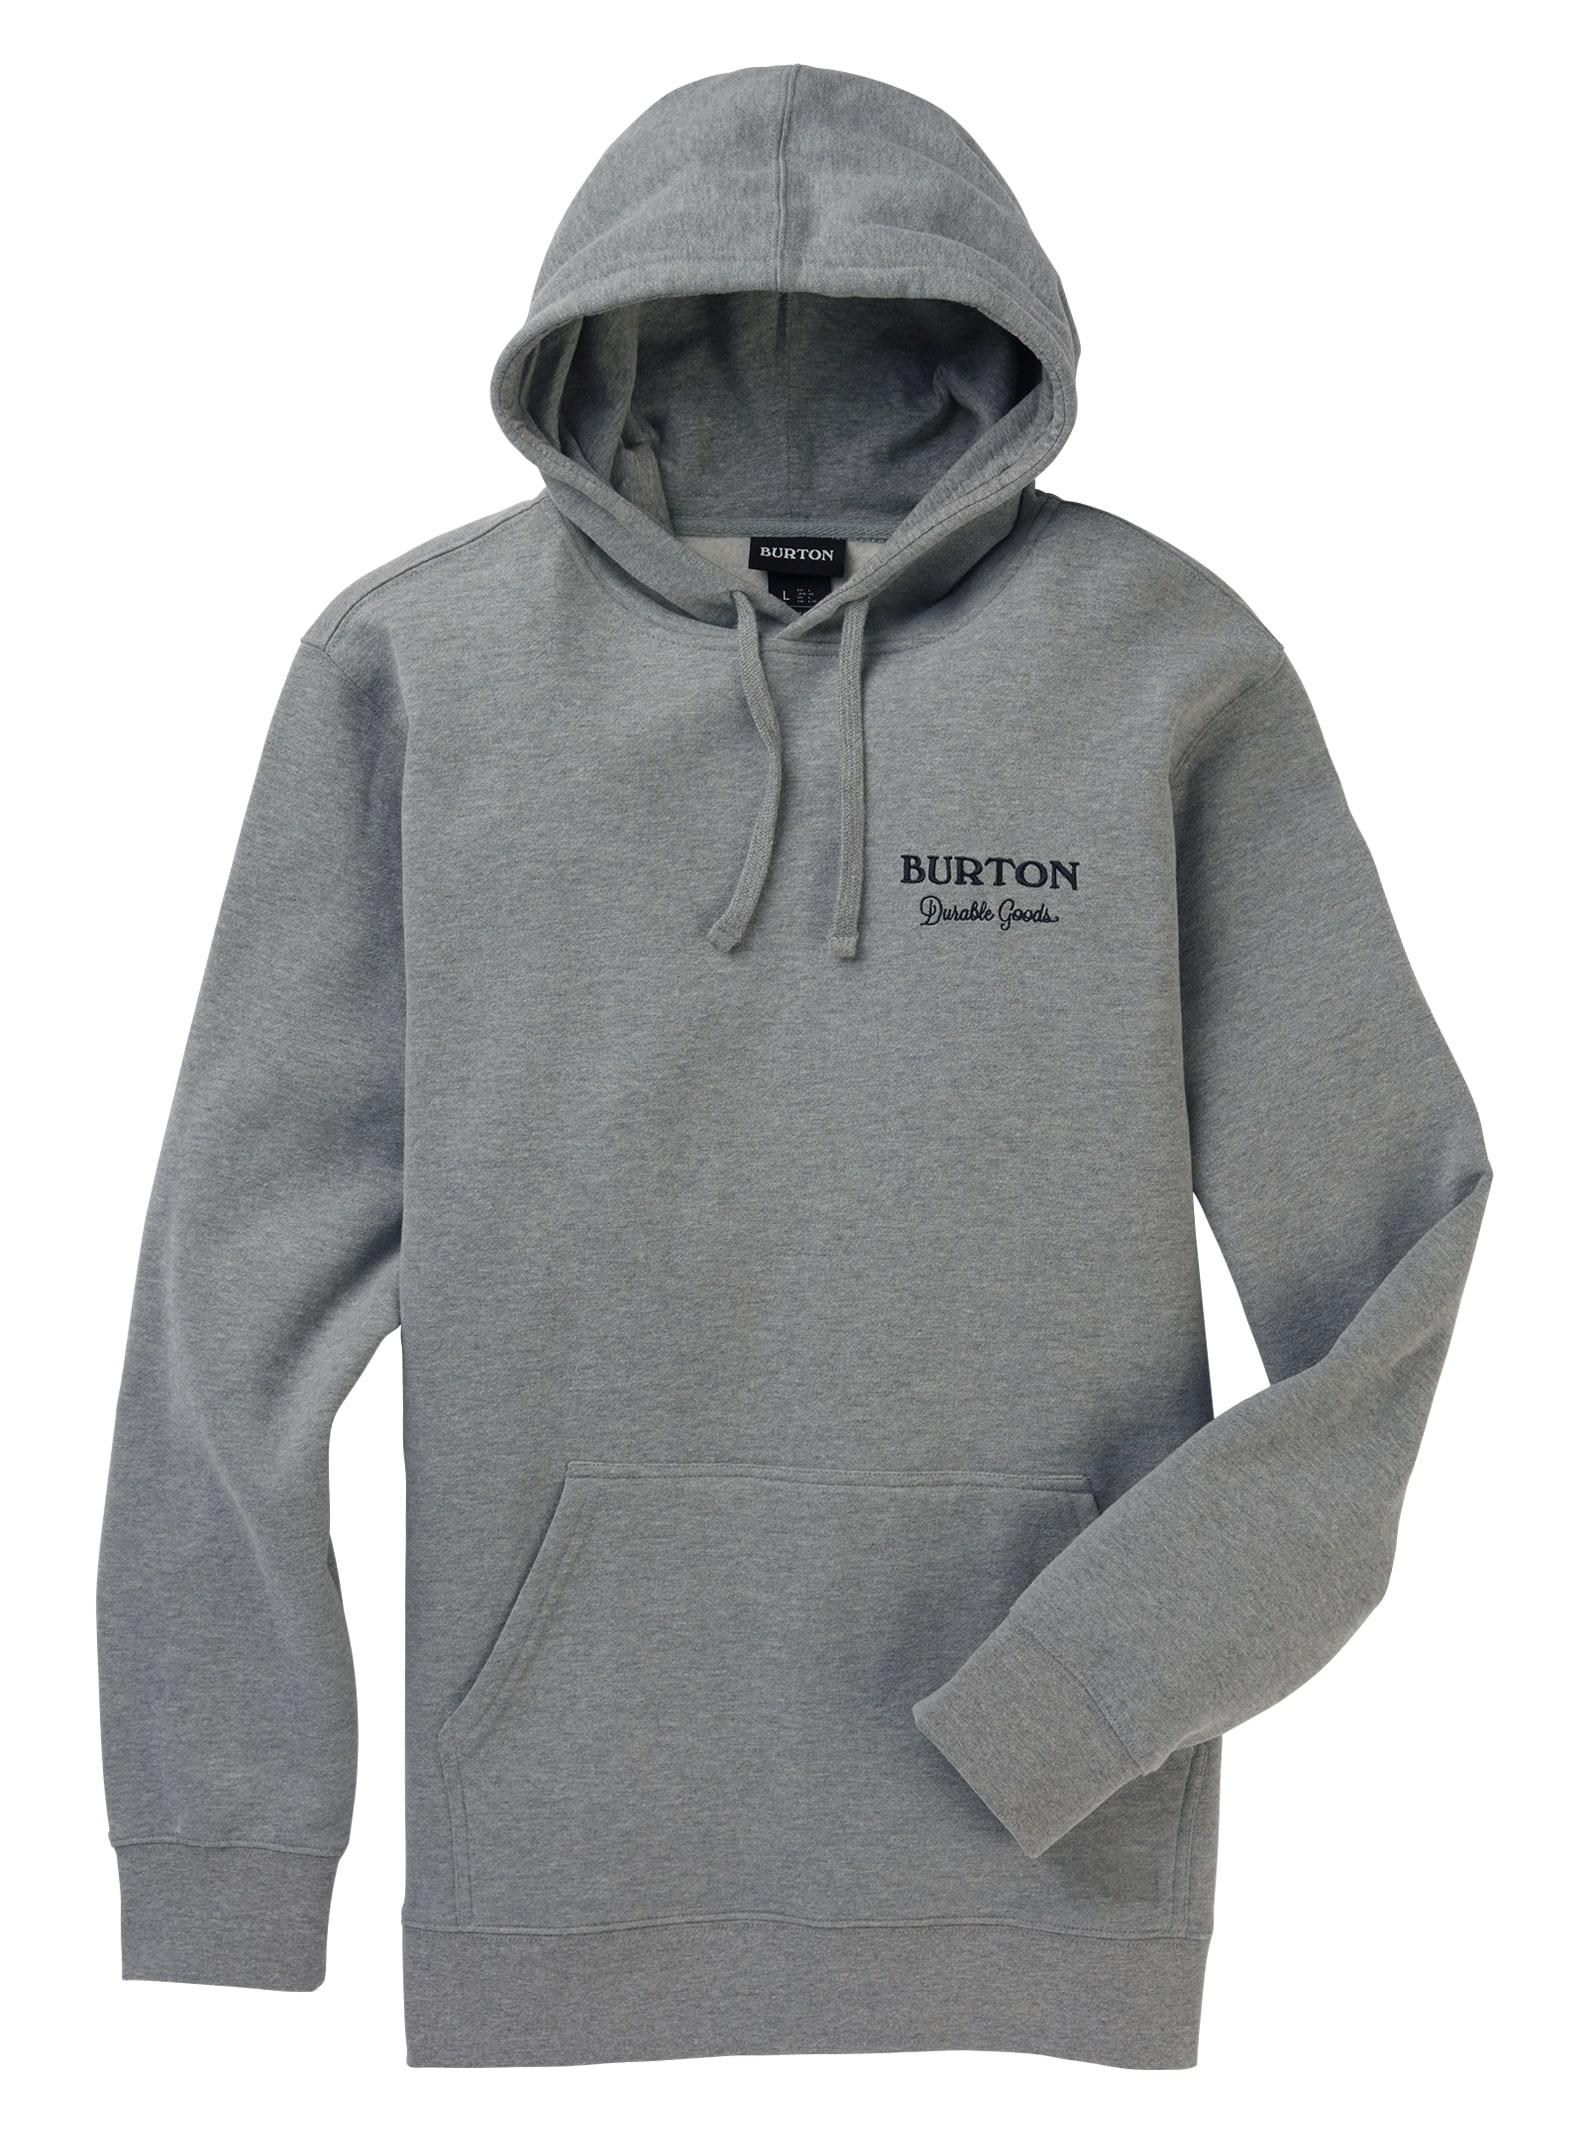 Burton Durable Goods Hoodie für Herren | Winter